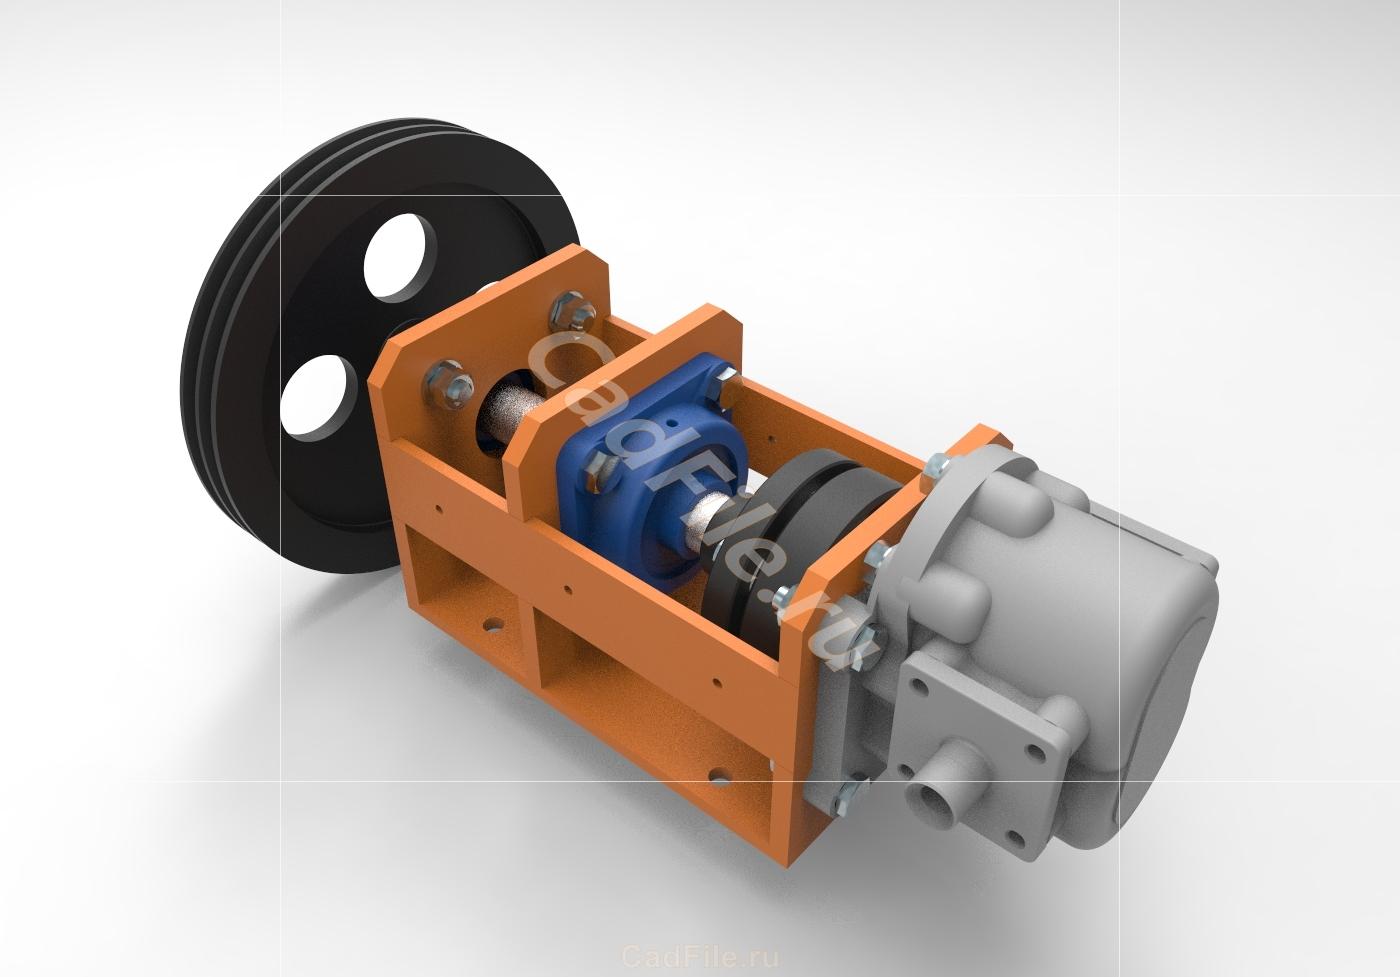 привод насоса НШ32 3D-модель